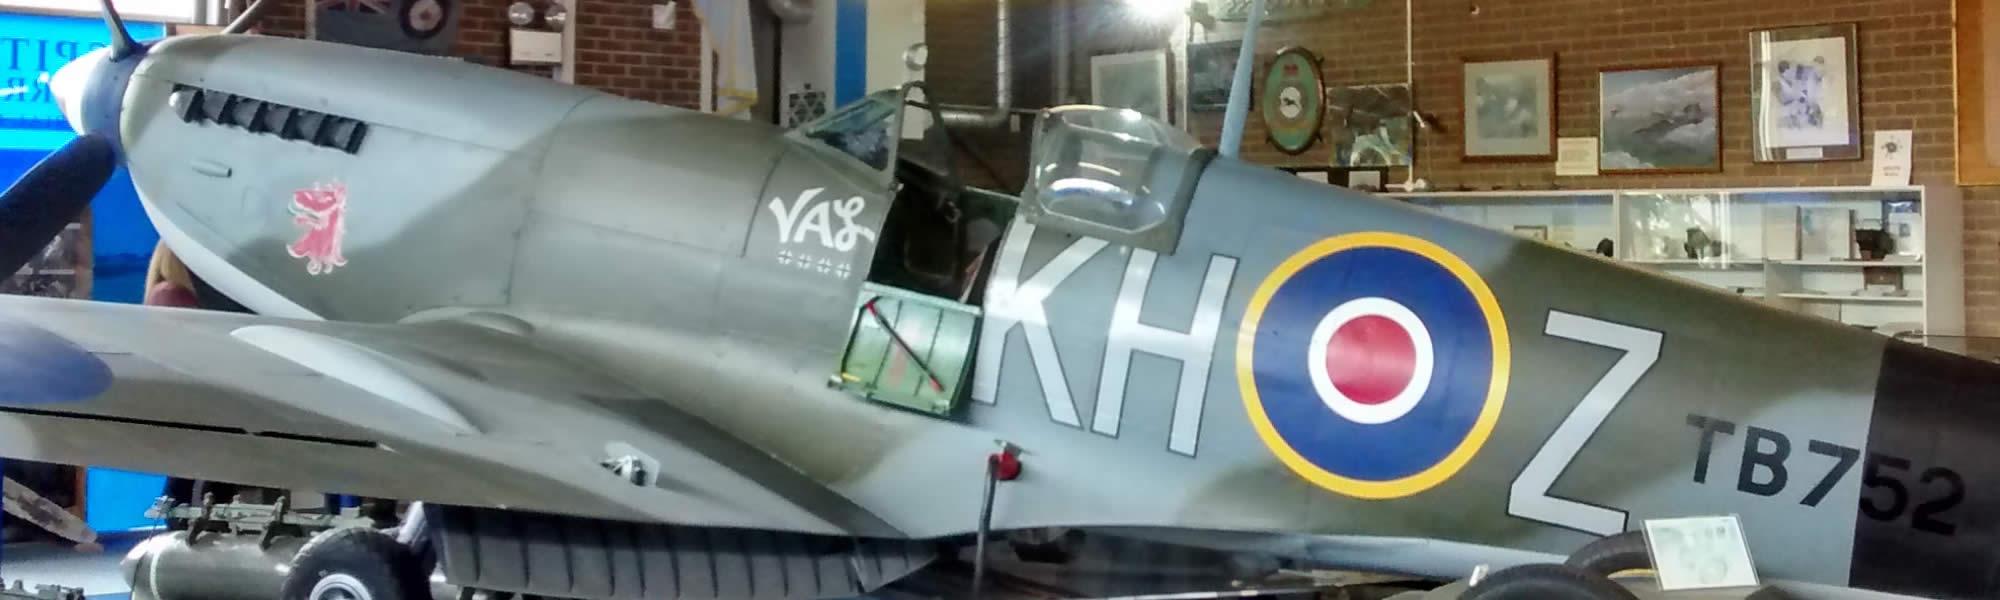 Spitfire Museum - Visit Ramsgate